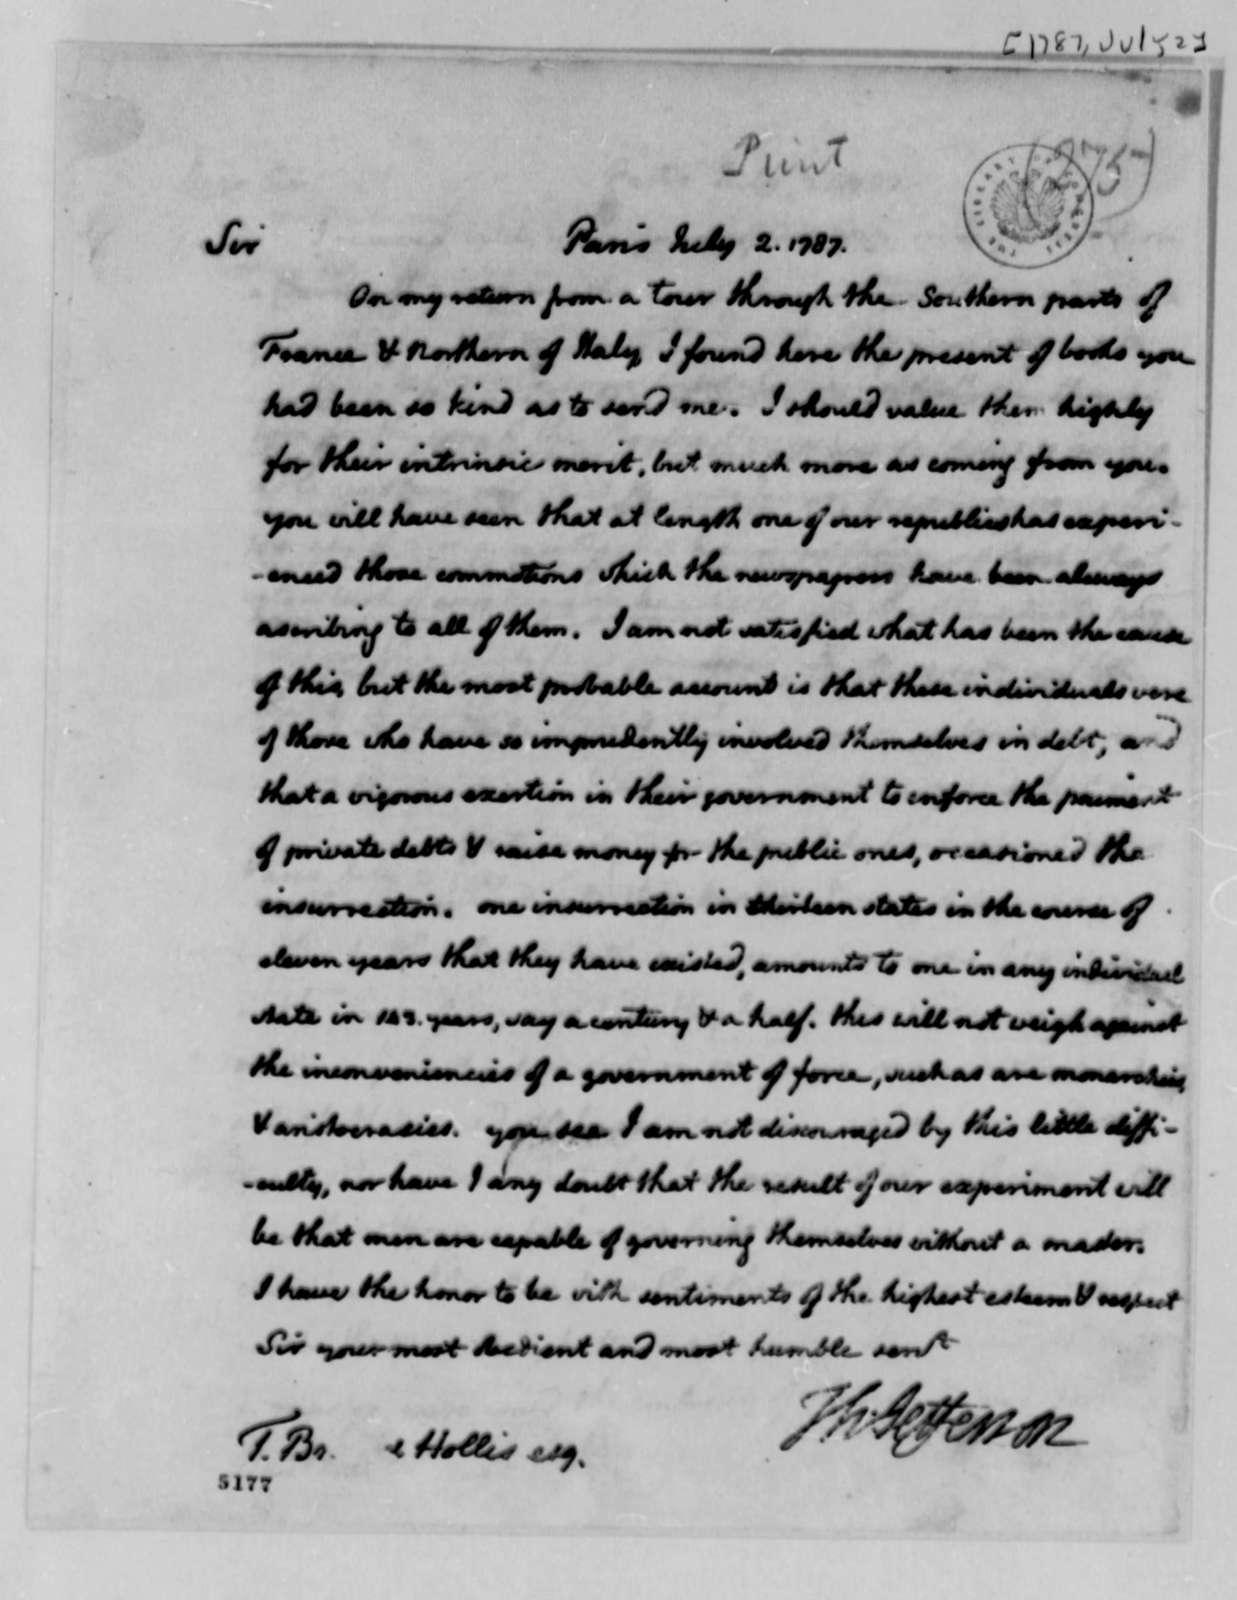 Thomas Jefferson to Thomas Brand Hollis, July 2, 1787